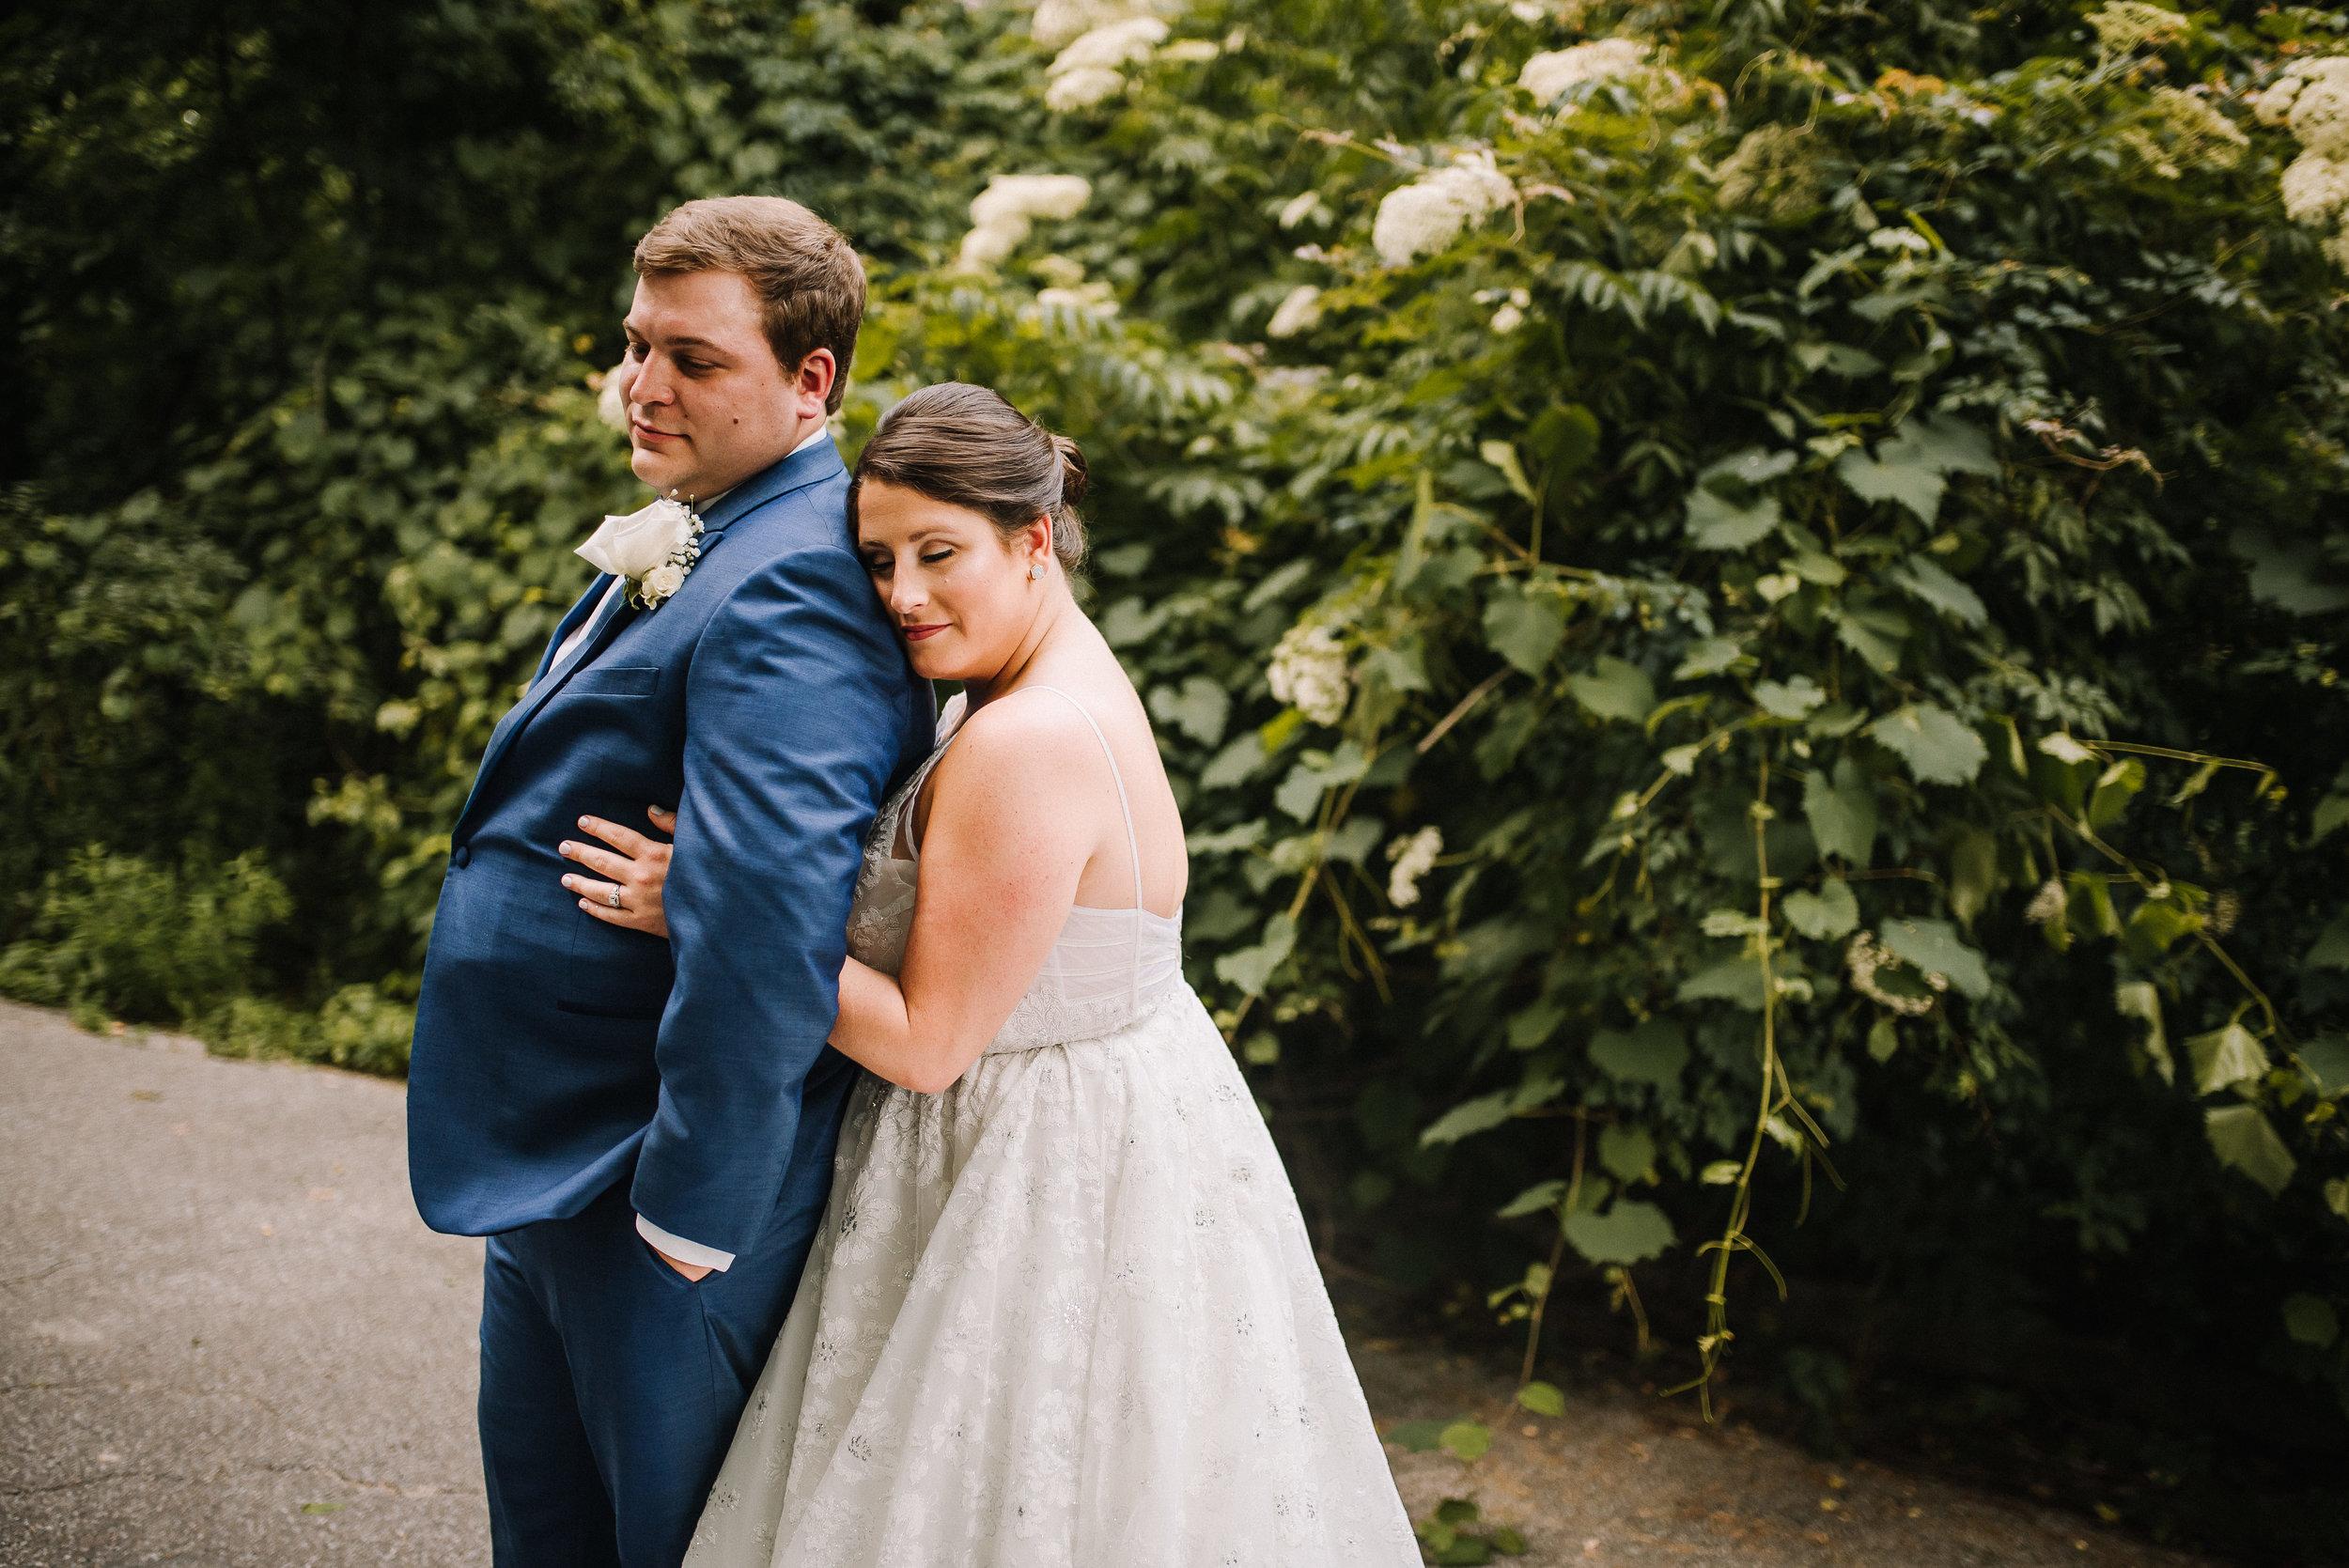 Smith Wedding_Memphis Zoo_Ashley Benham Photography-220.jpg